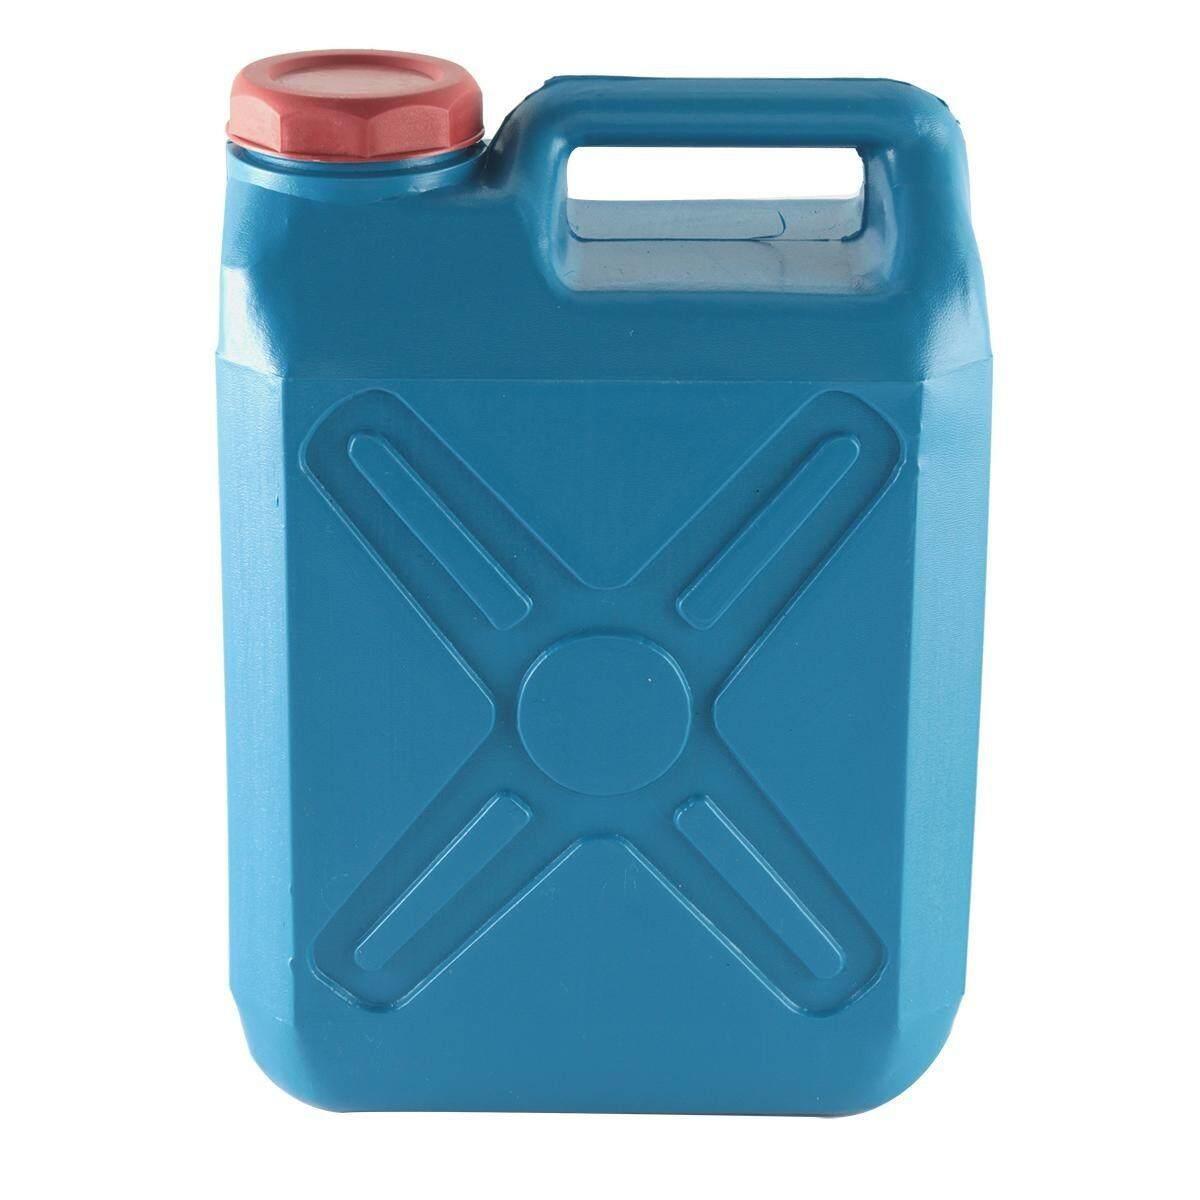 Bn&p Shop ถังใส่น้ำมัน ถังแกลลอนพลาสติก สีฟ้า.